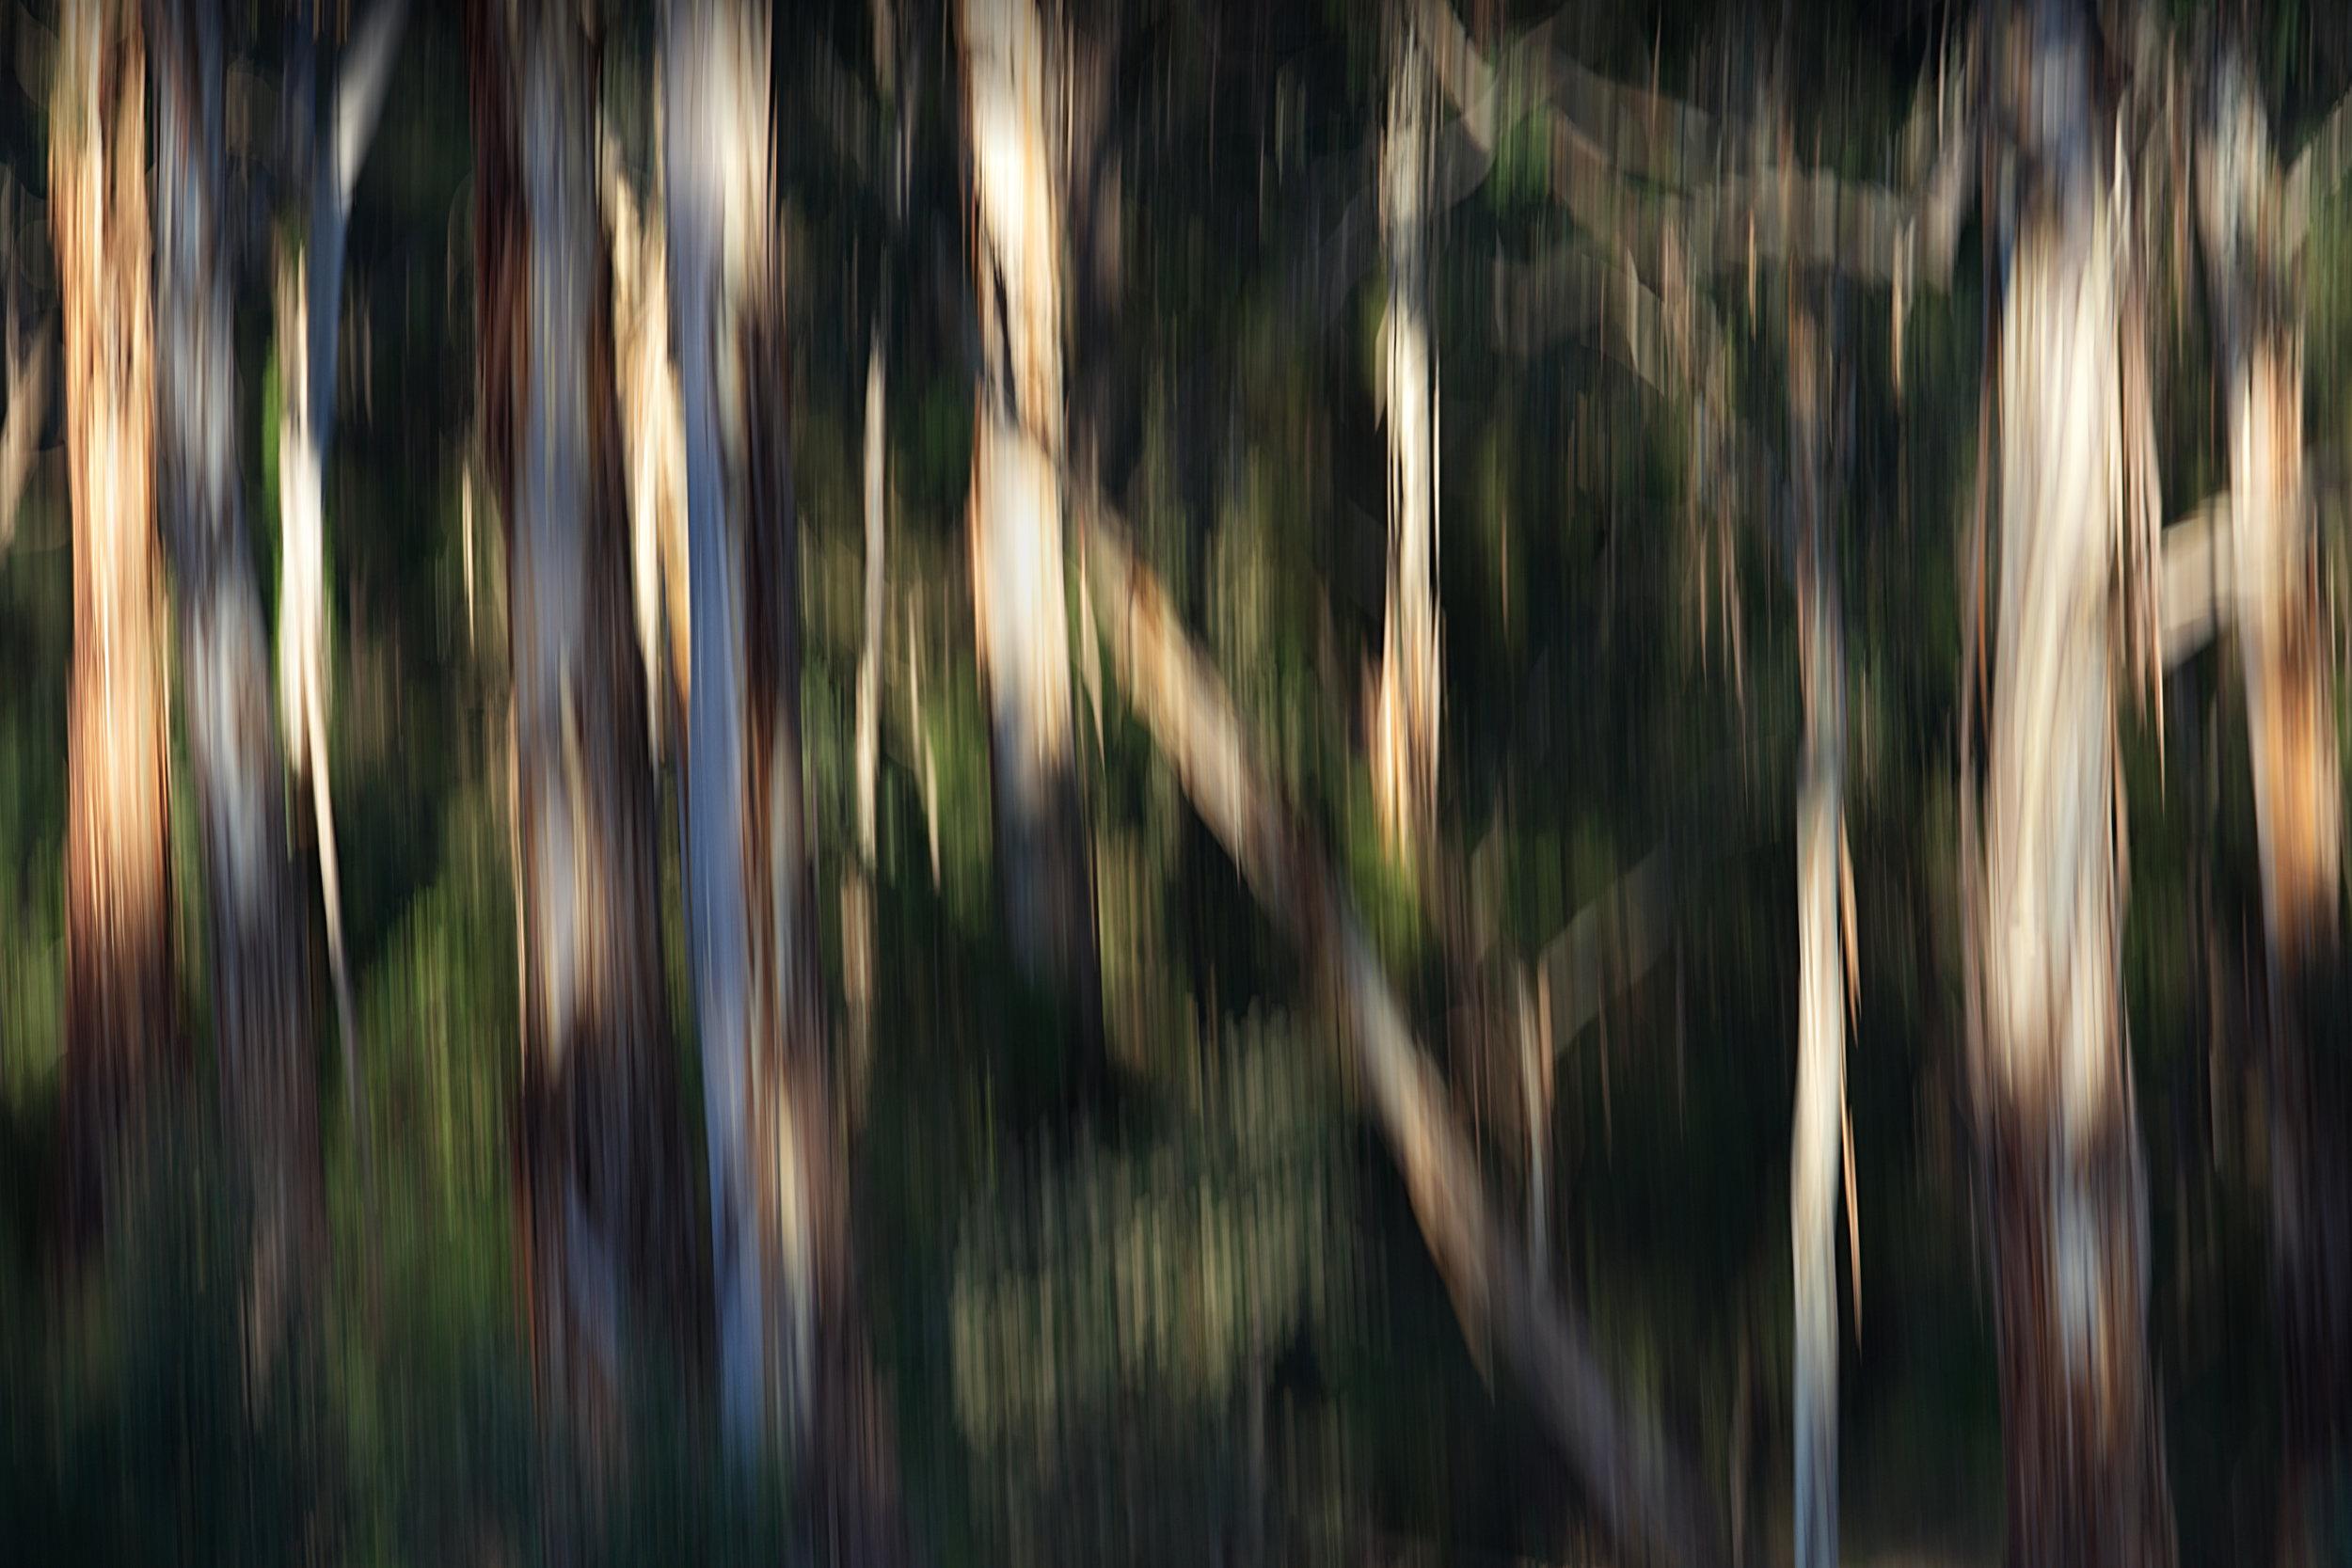 18-12-26-Warrandyte River-SONY-ILCE-7M3-2958 - no border - bw - colour.jpg